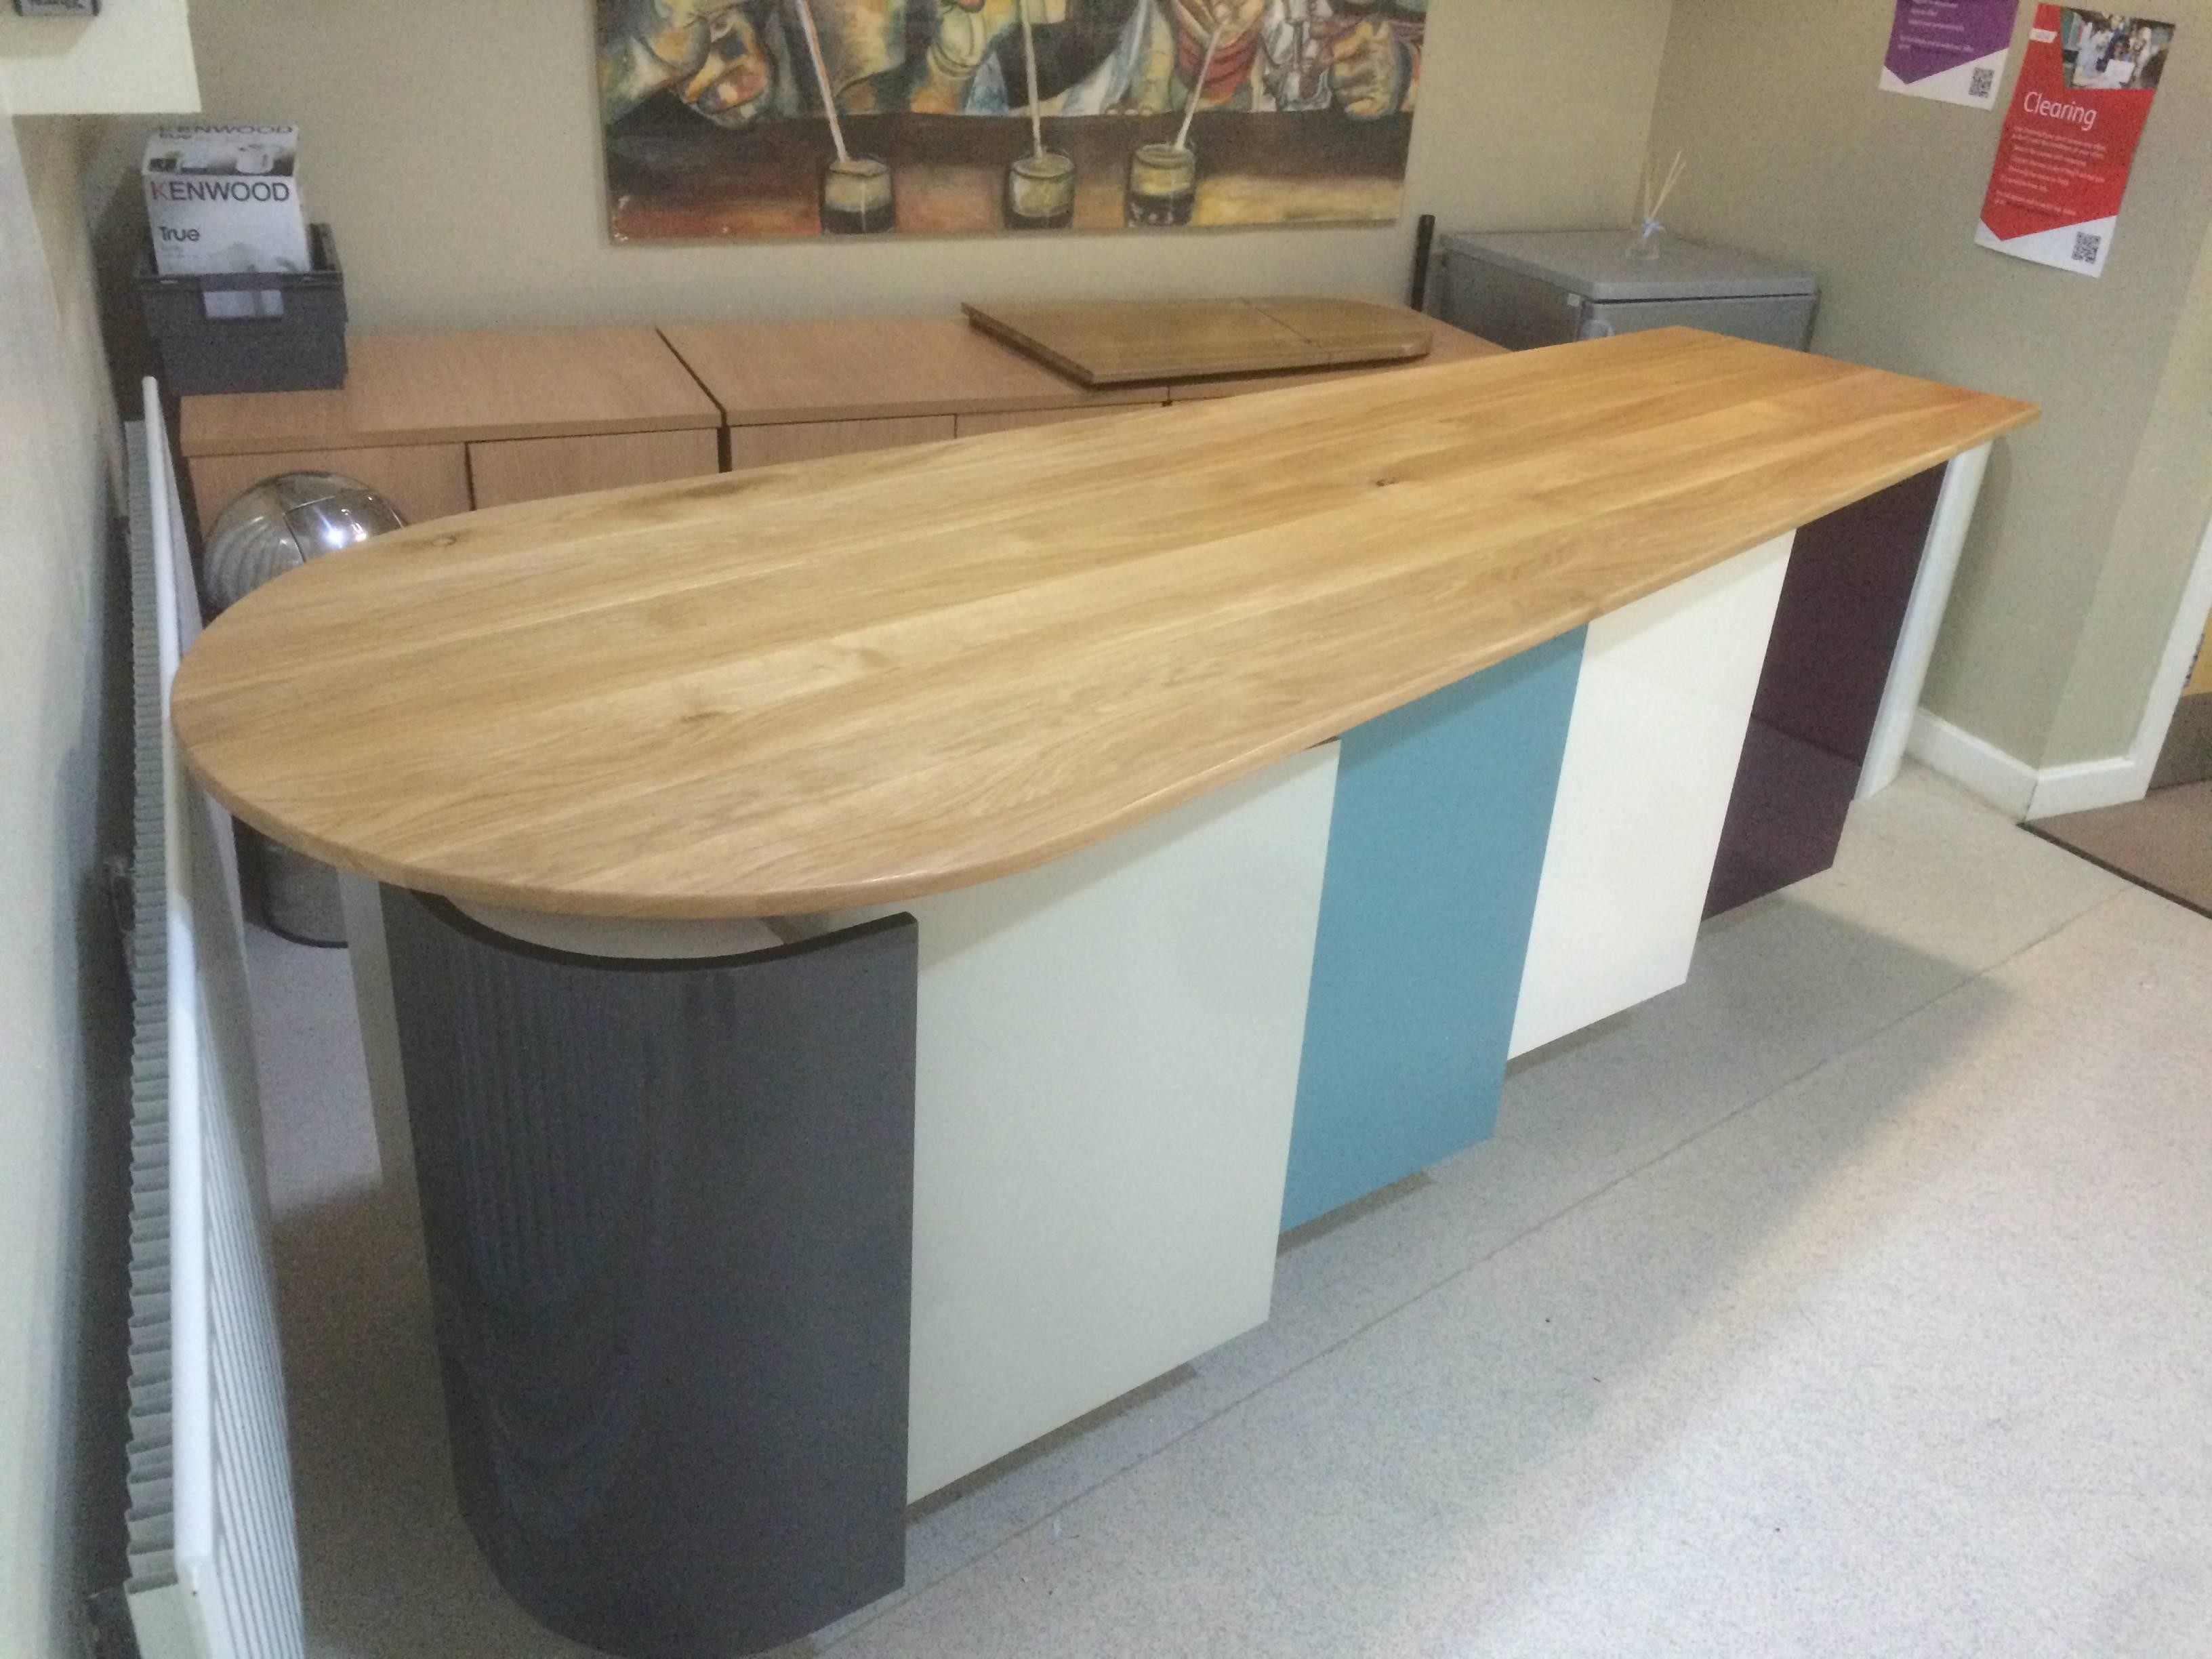 Bespoke kitchen unit for school.